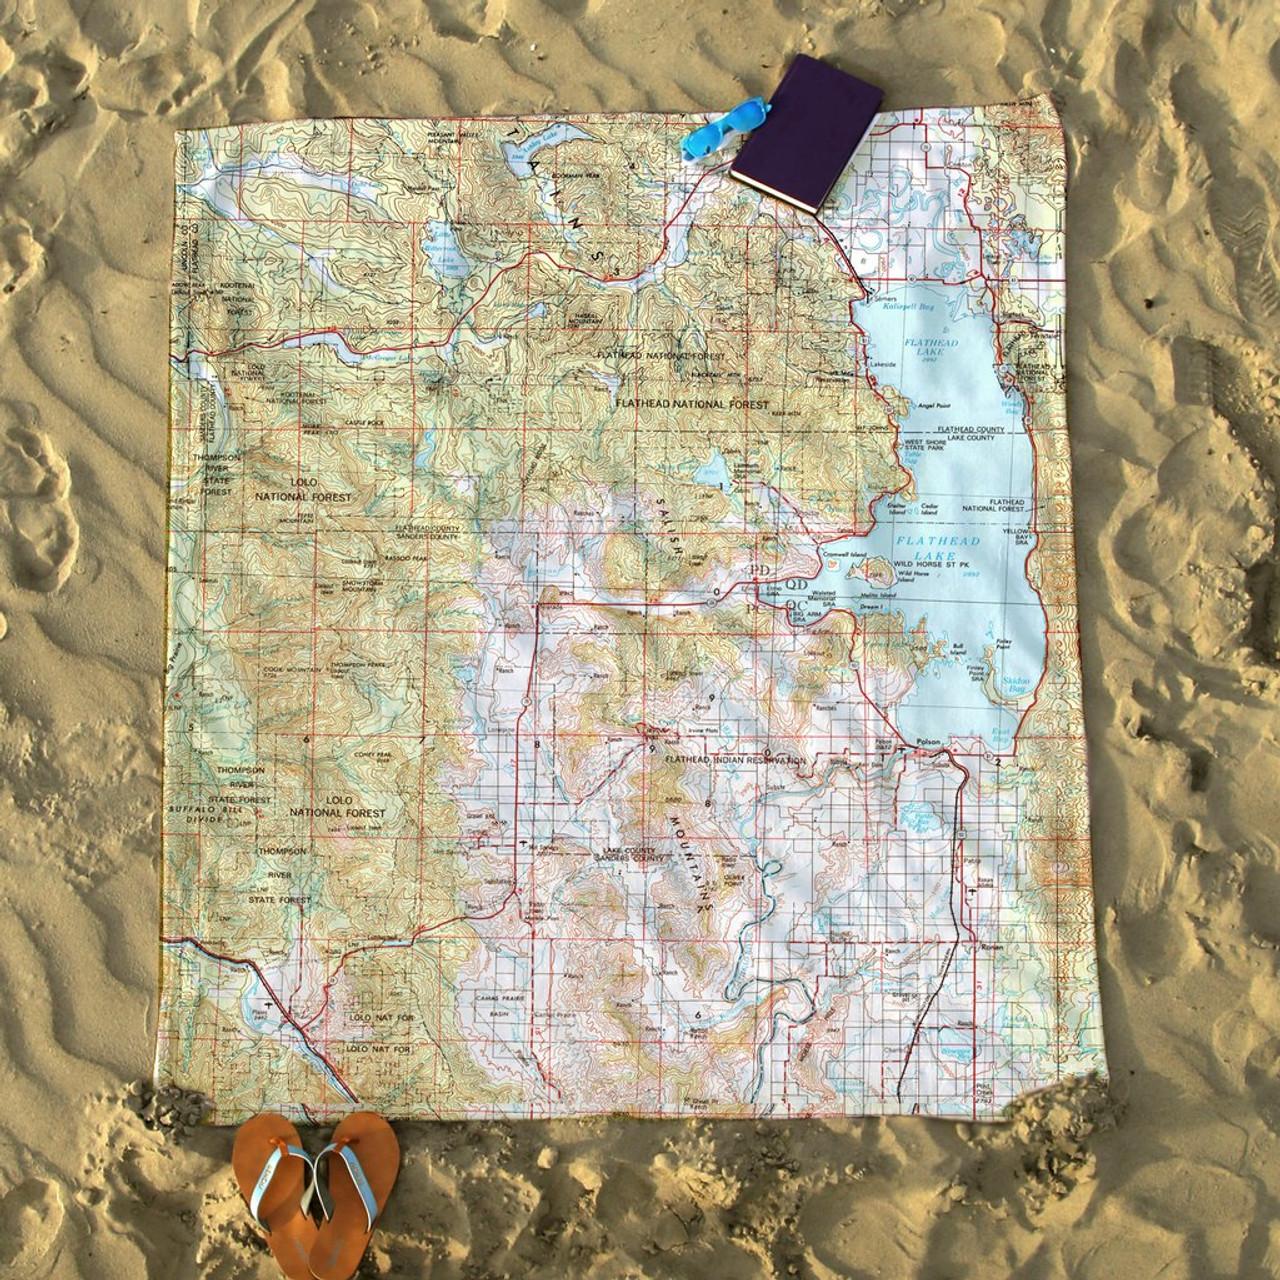 Nautical Blanket - Woonsocket to Blackstone, MA